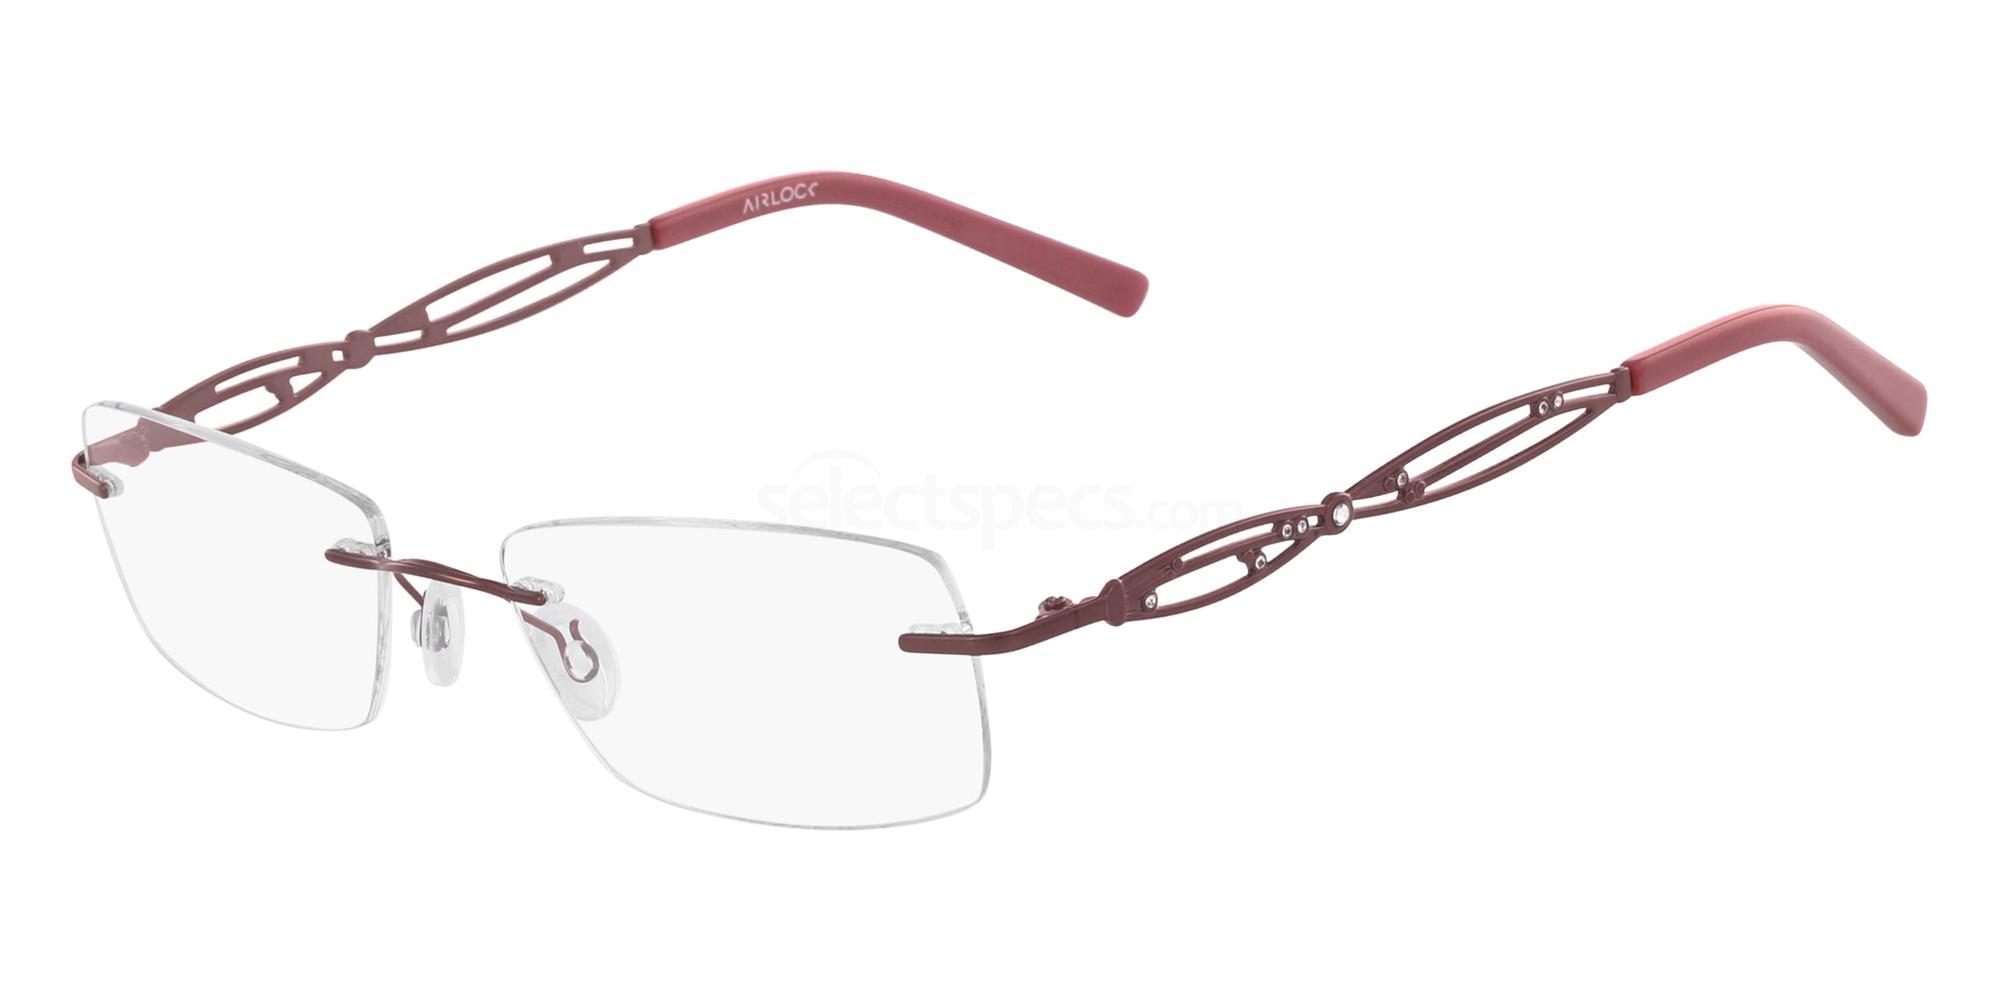 604 ENCHANTMENT 204 Glasses, AIRLOCK